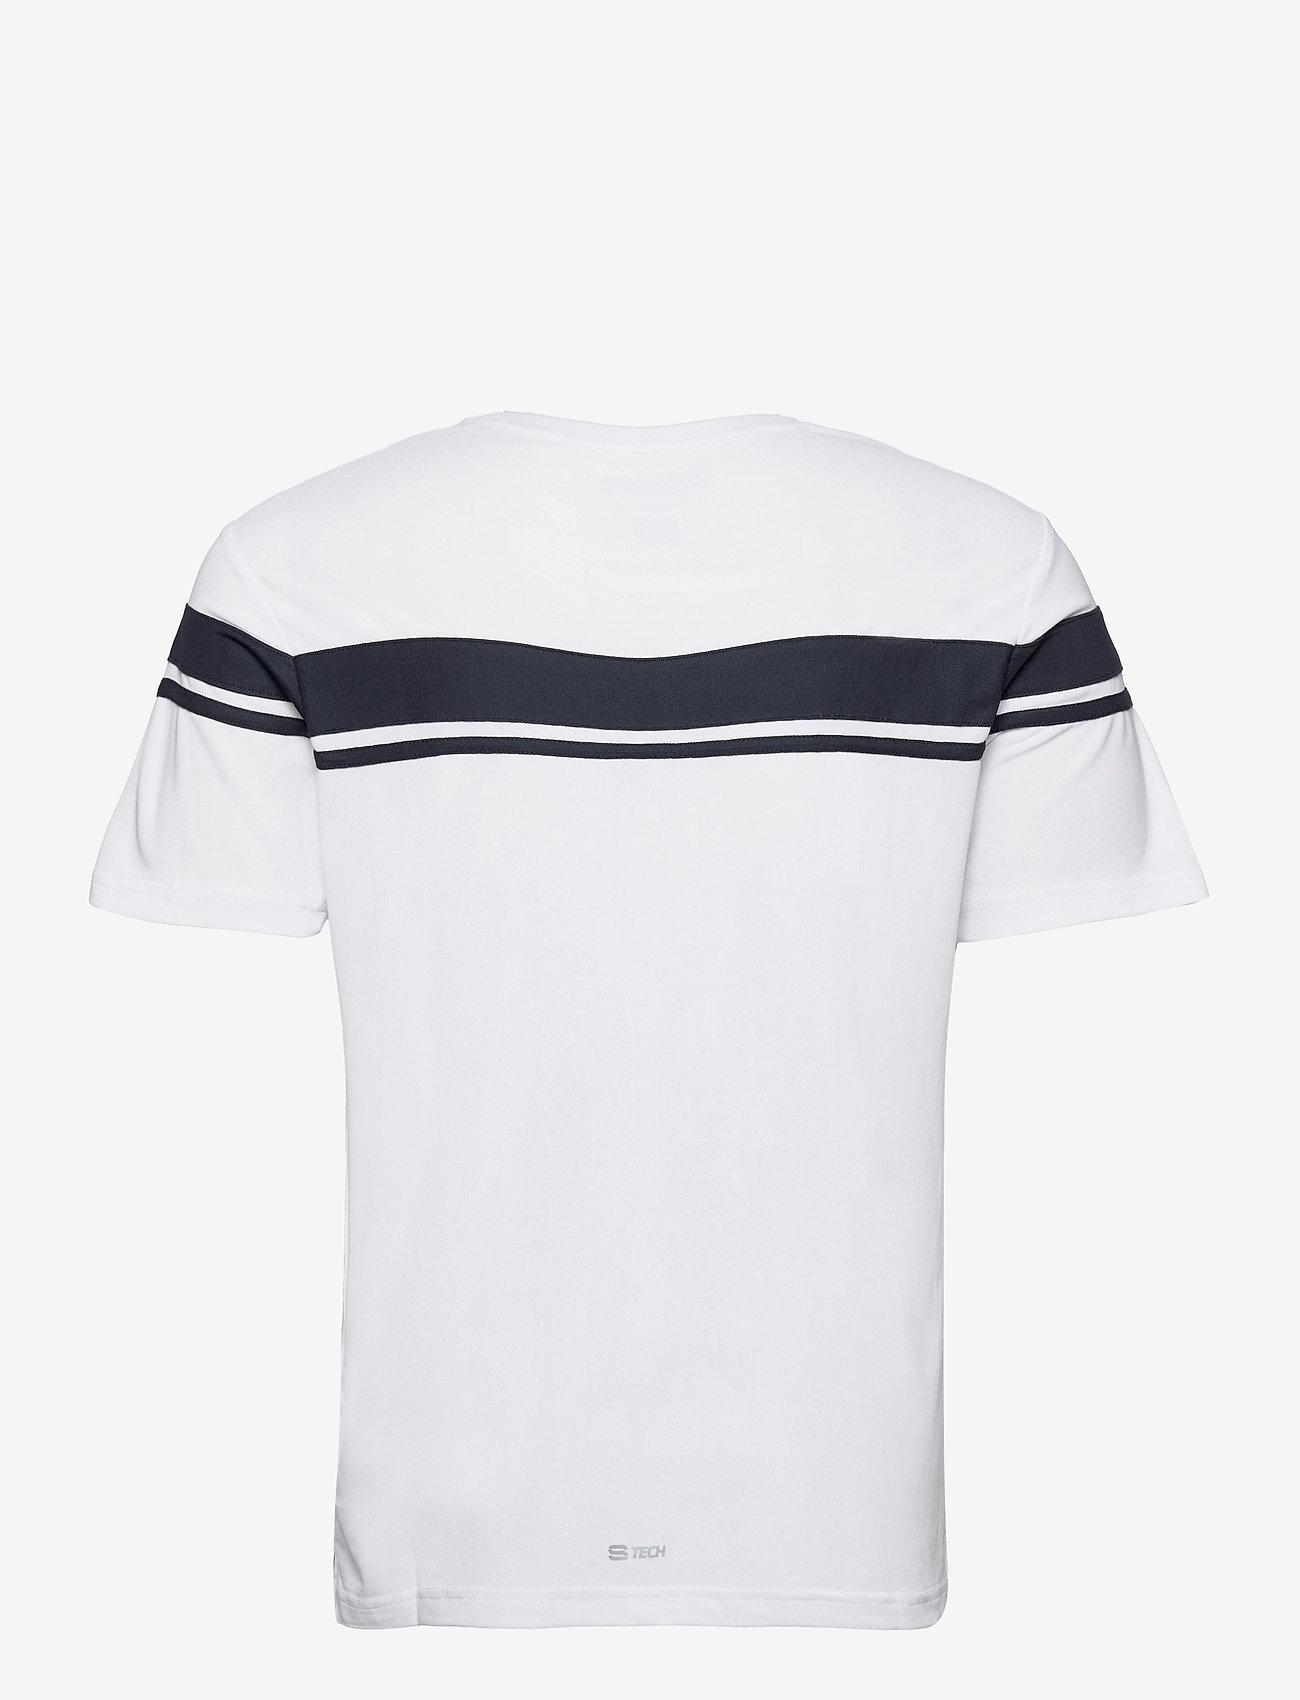 Sergio Tacchini - YOUNG LINE PRO T-SHIRT - t-shirts - white/navy - 1